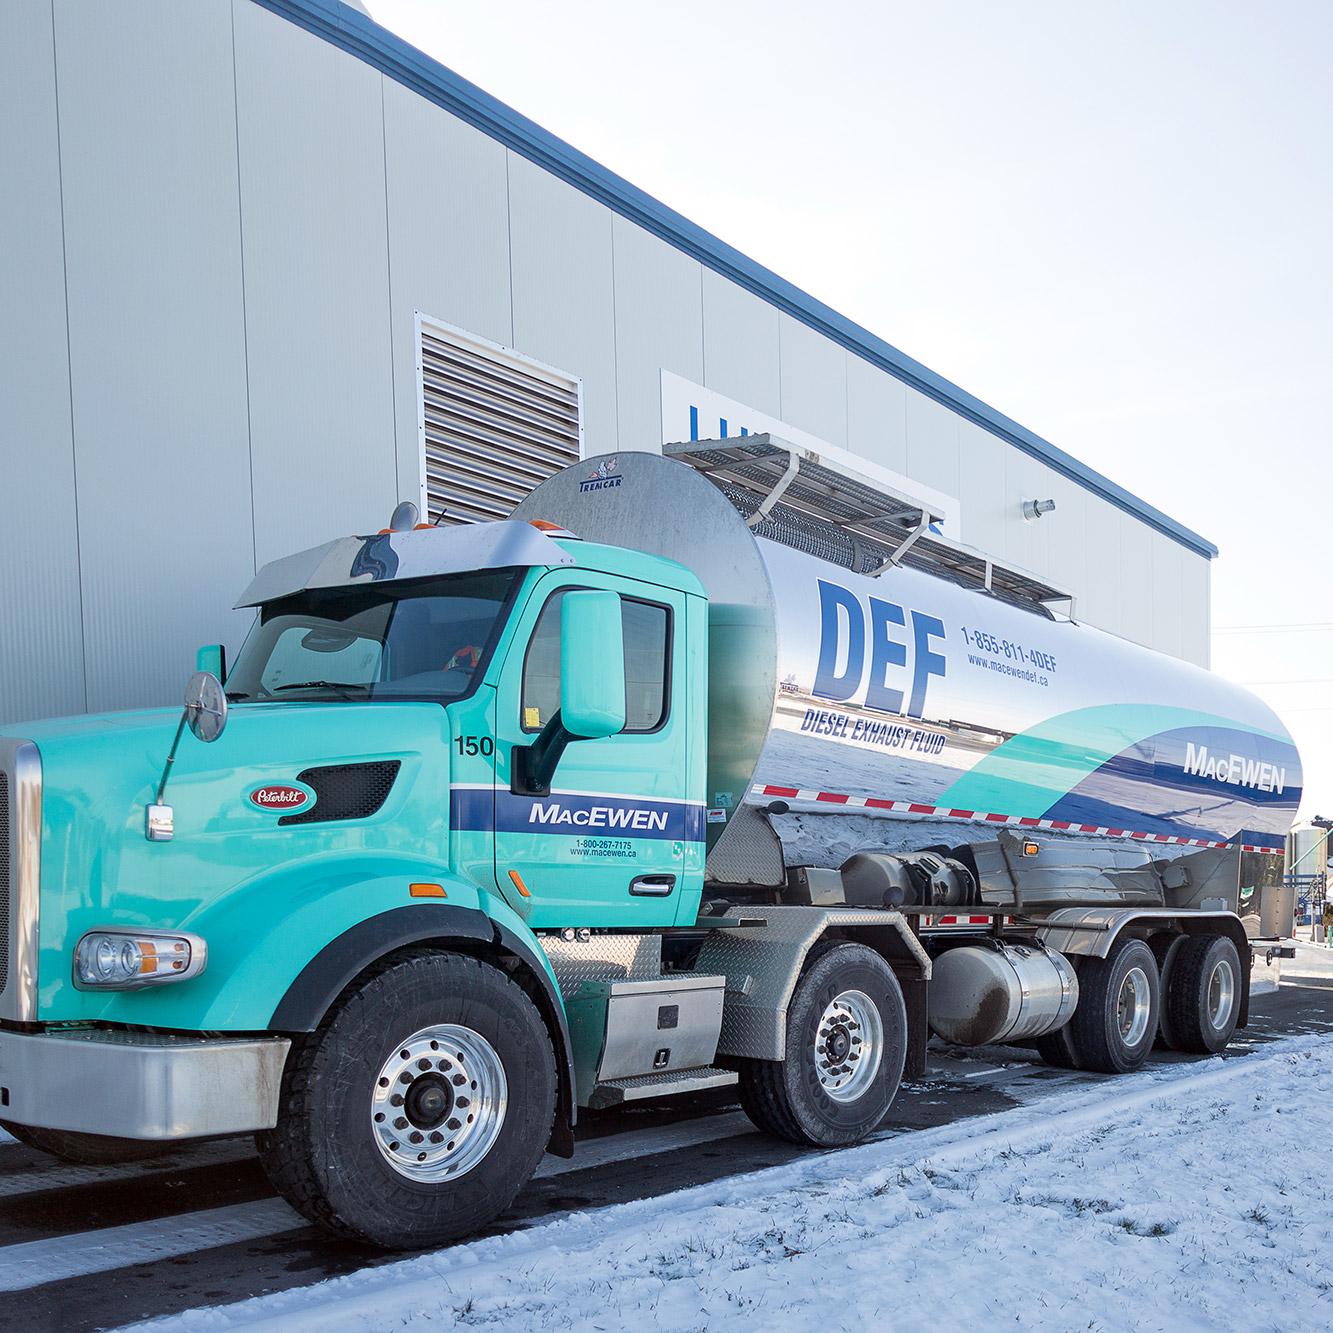 DEF - MacEwen Petroleum Inc